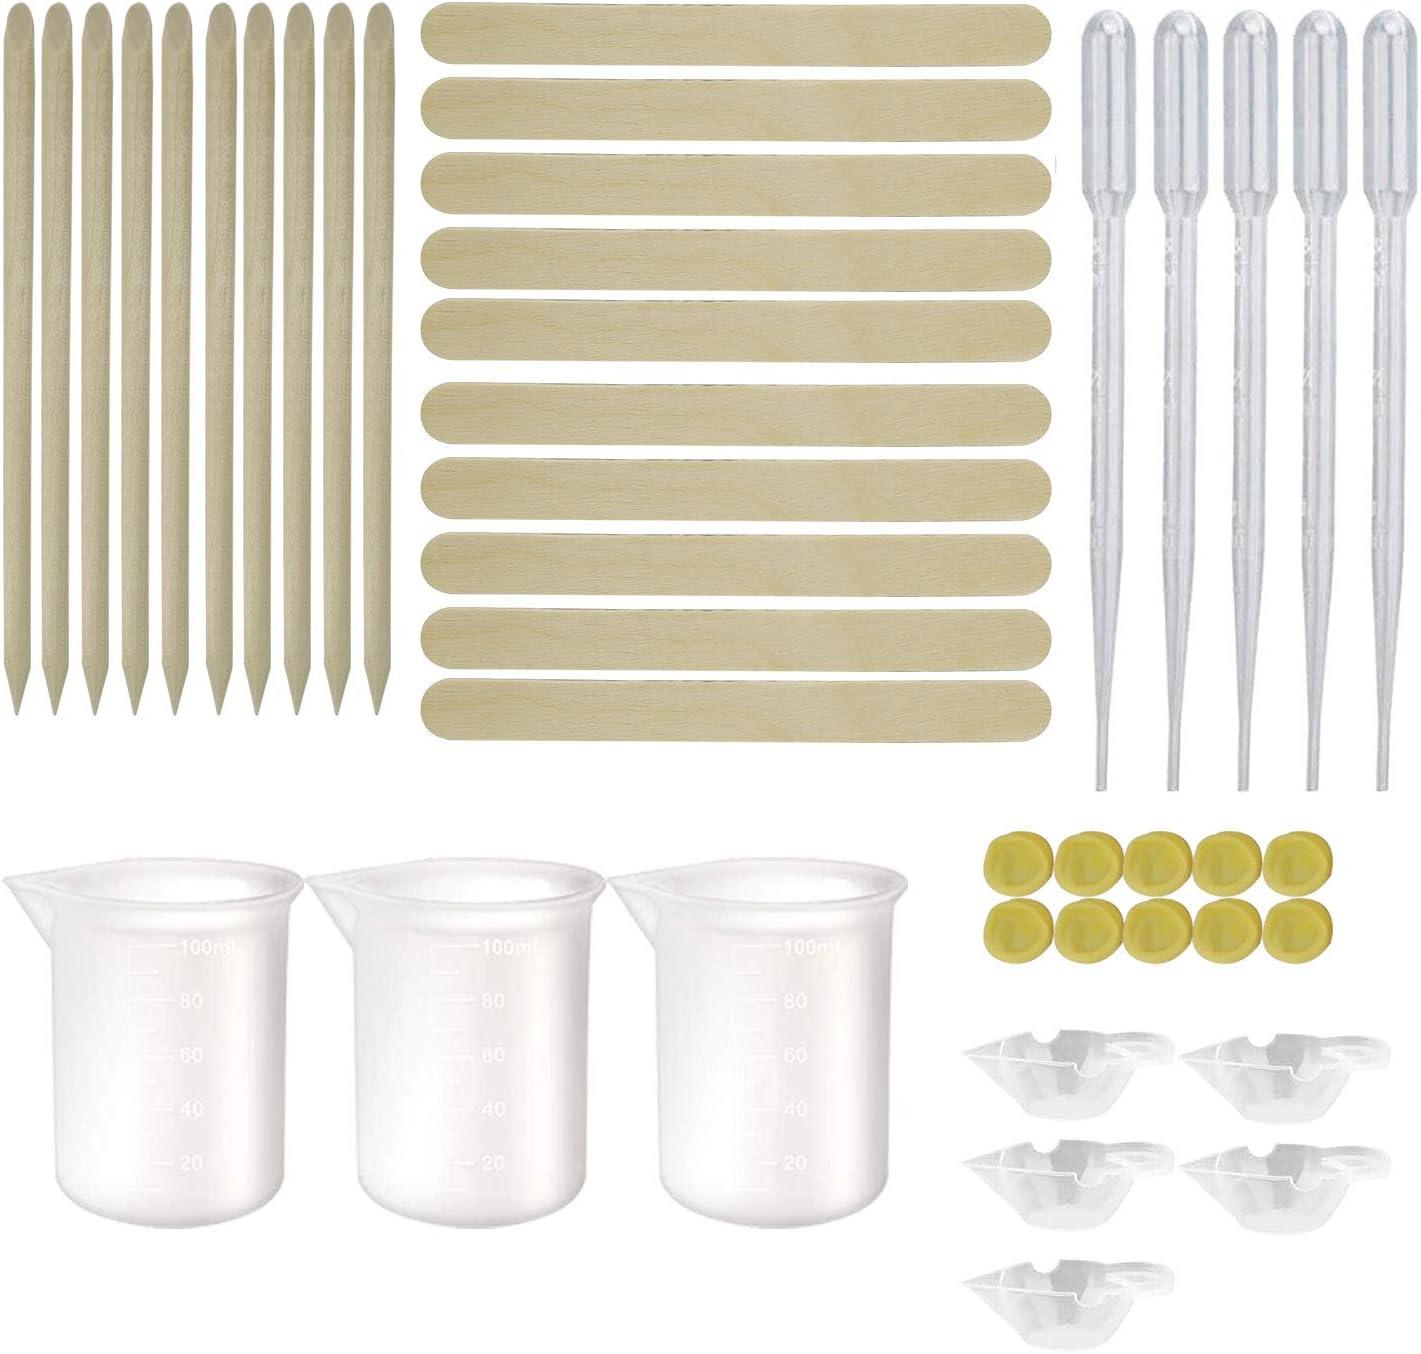 43 PCS Resin Kit Tools Silicone mart Measuring Cups Cu Kit- Reusable Sale